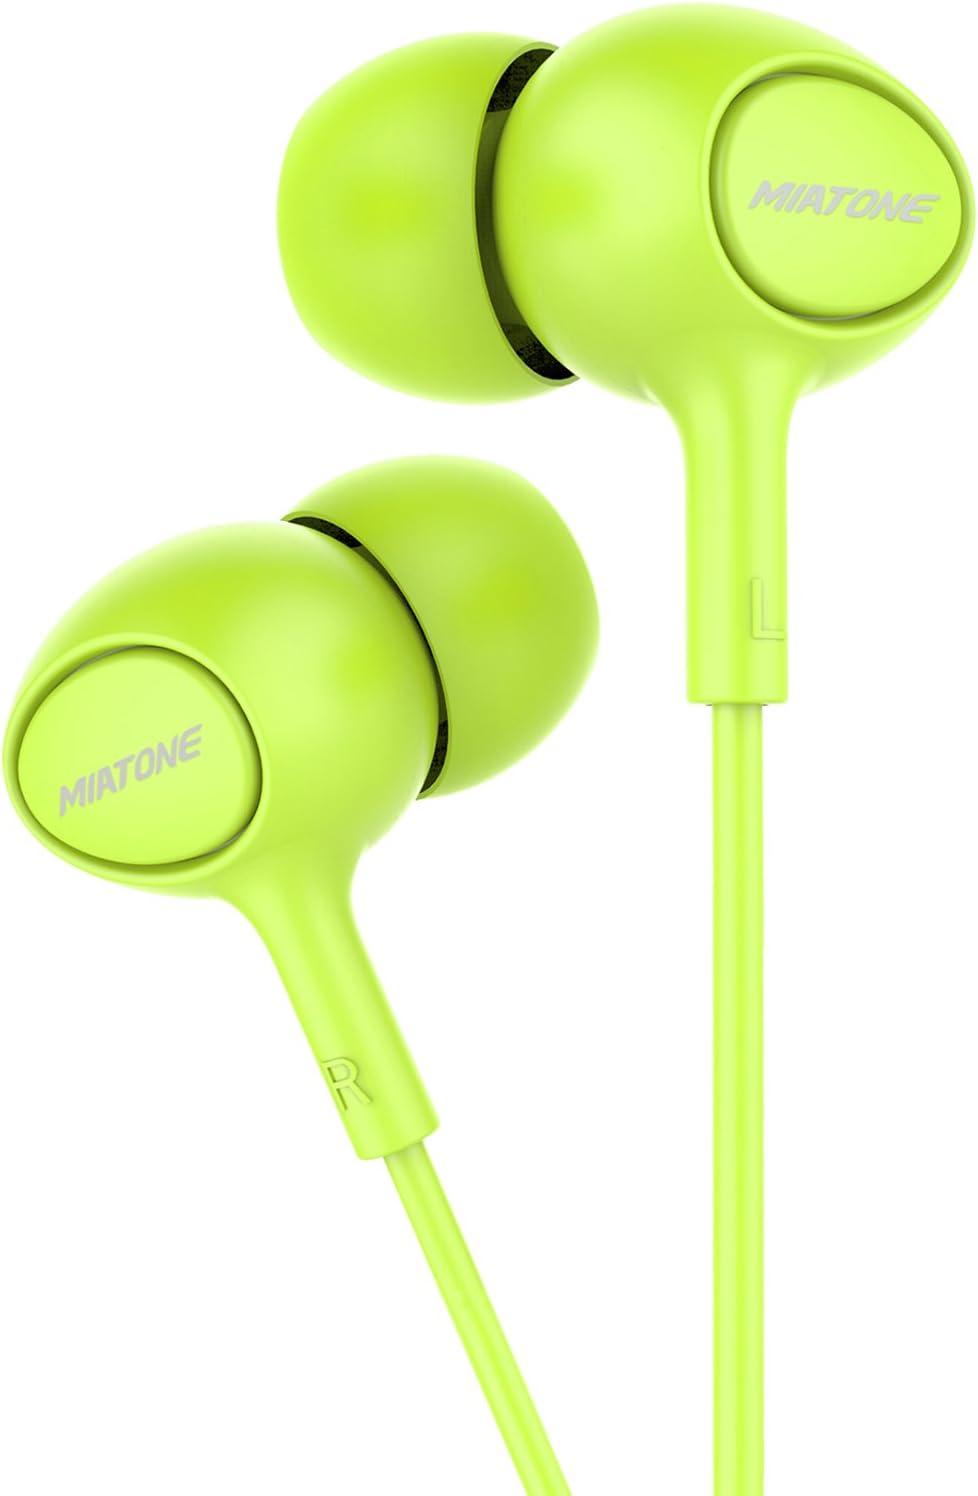 Earbuds with Microphone, MIATONE In-Ear Headphones, Wired Ergonomic Earphones Ear Buds - Green